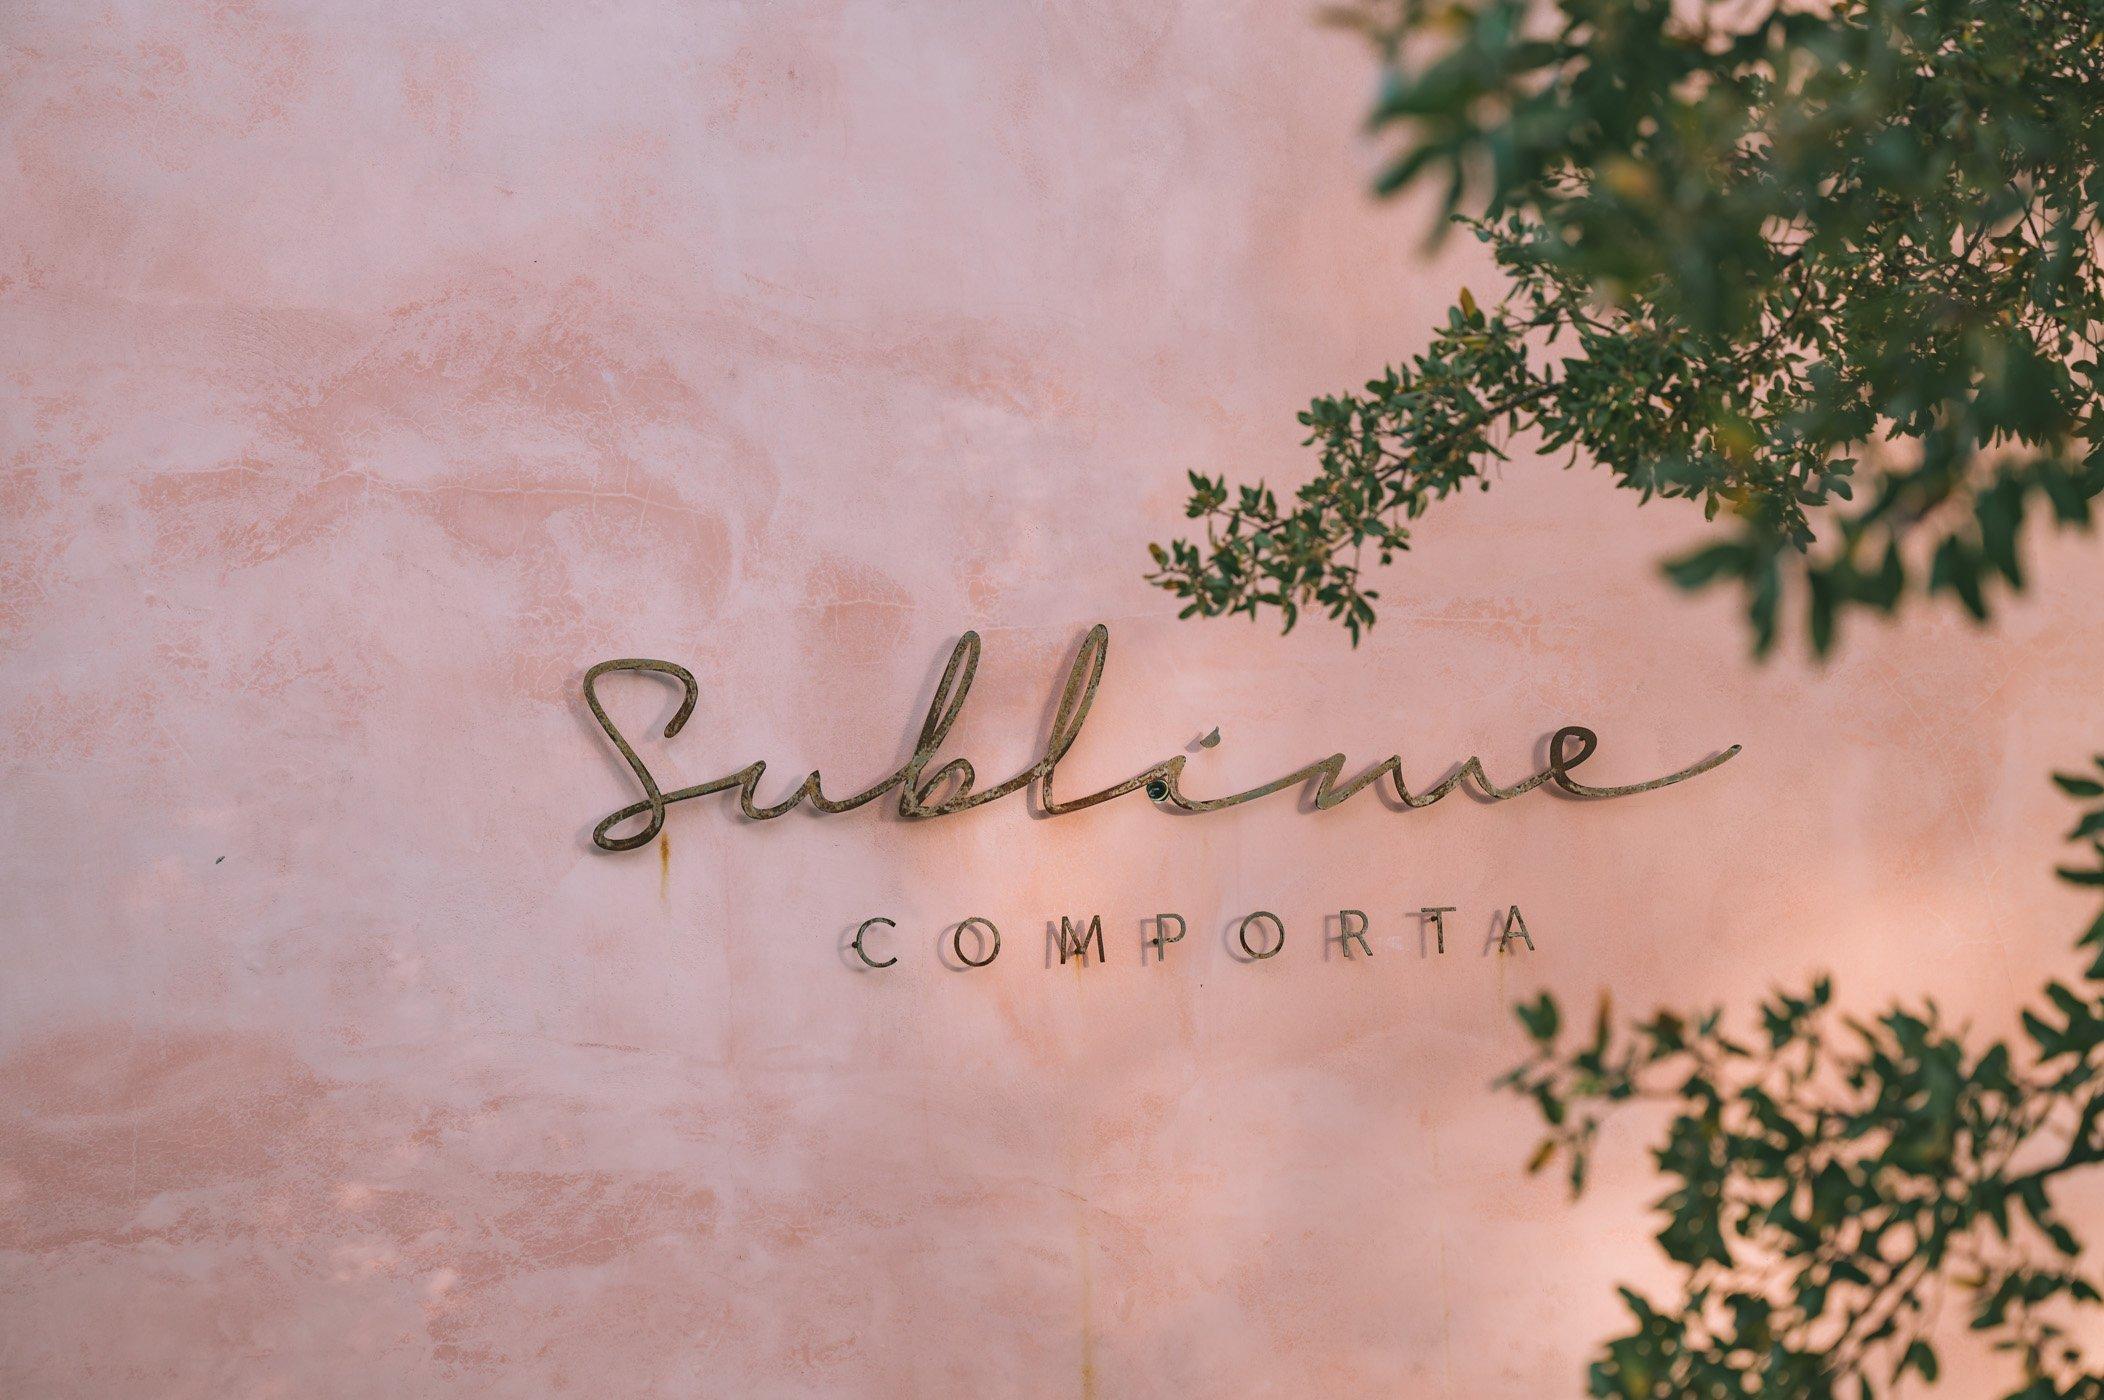 Sublime Comporta sign